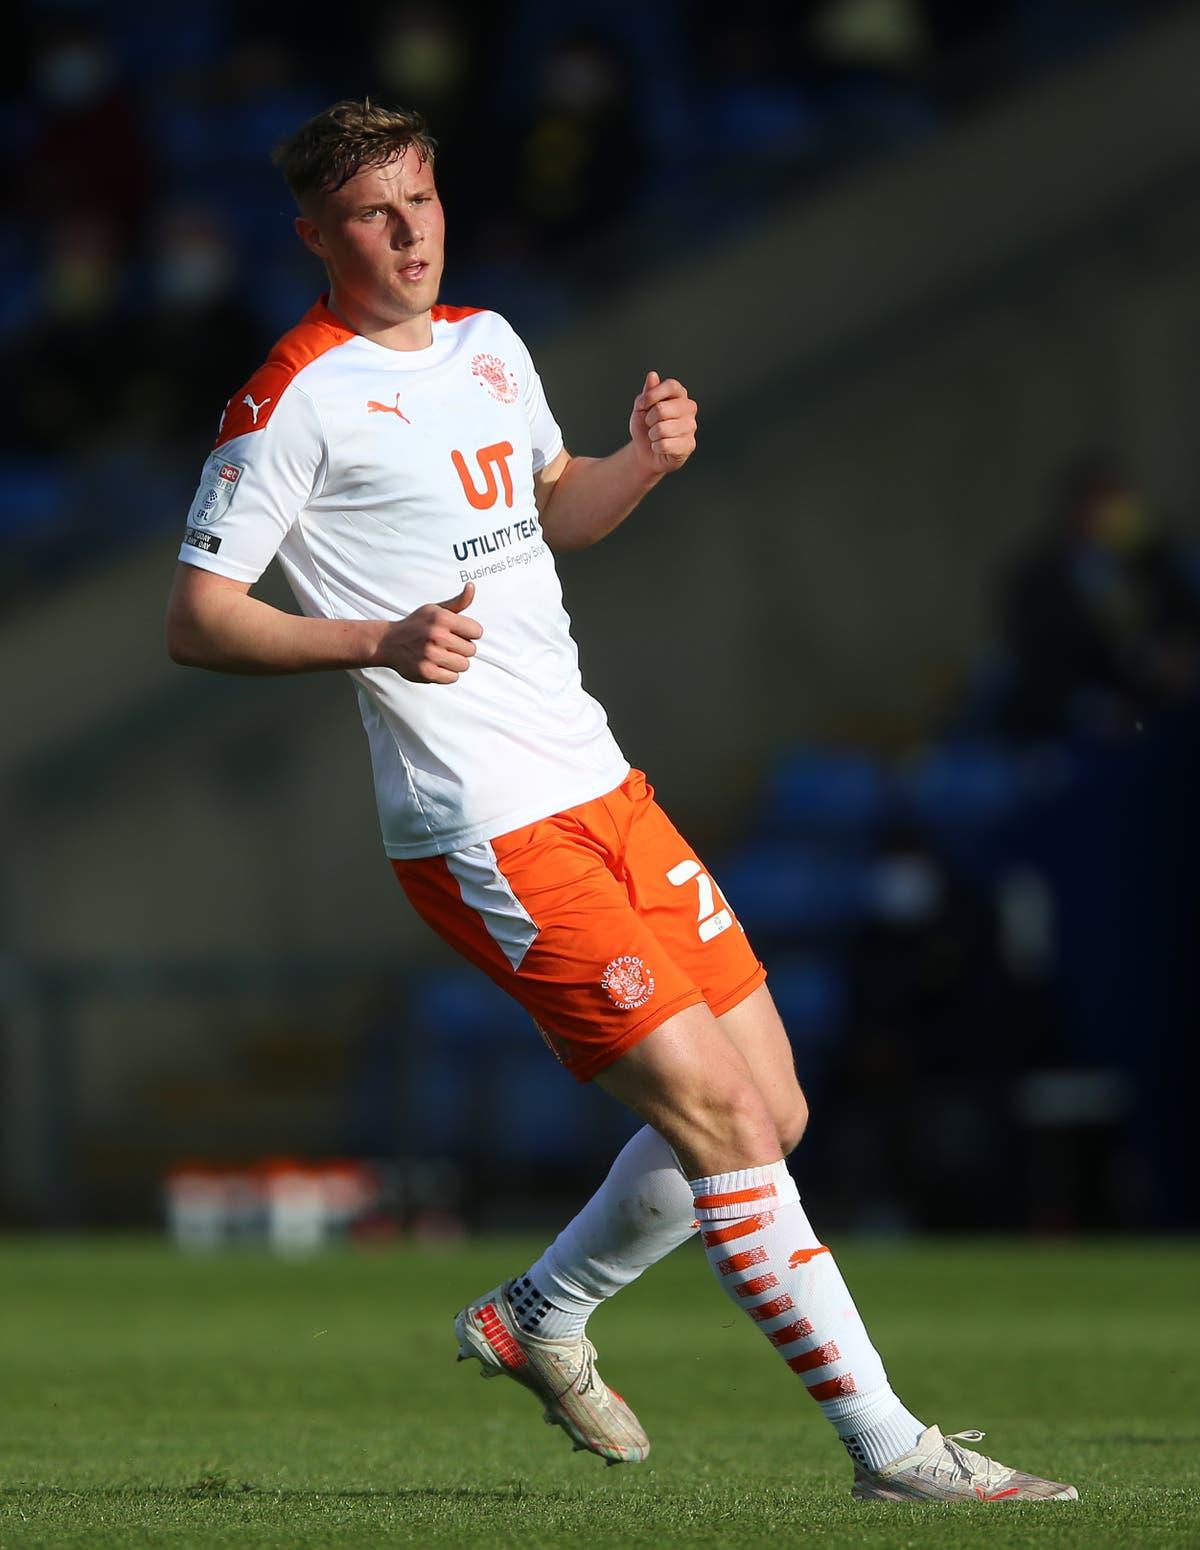 Blackpool defender Dan Ballard doubtful before play-off final against Lincoln